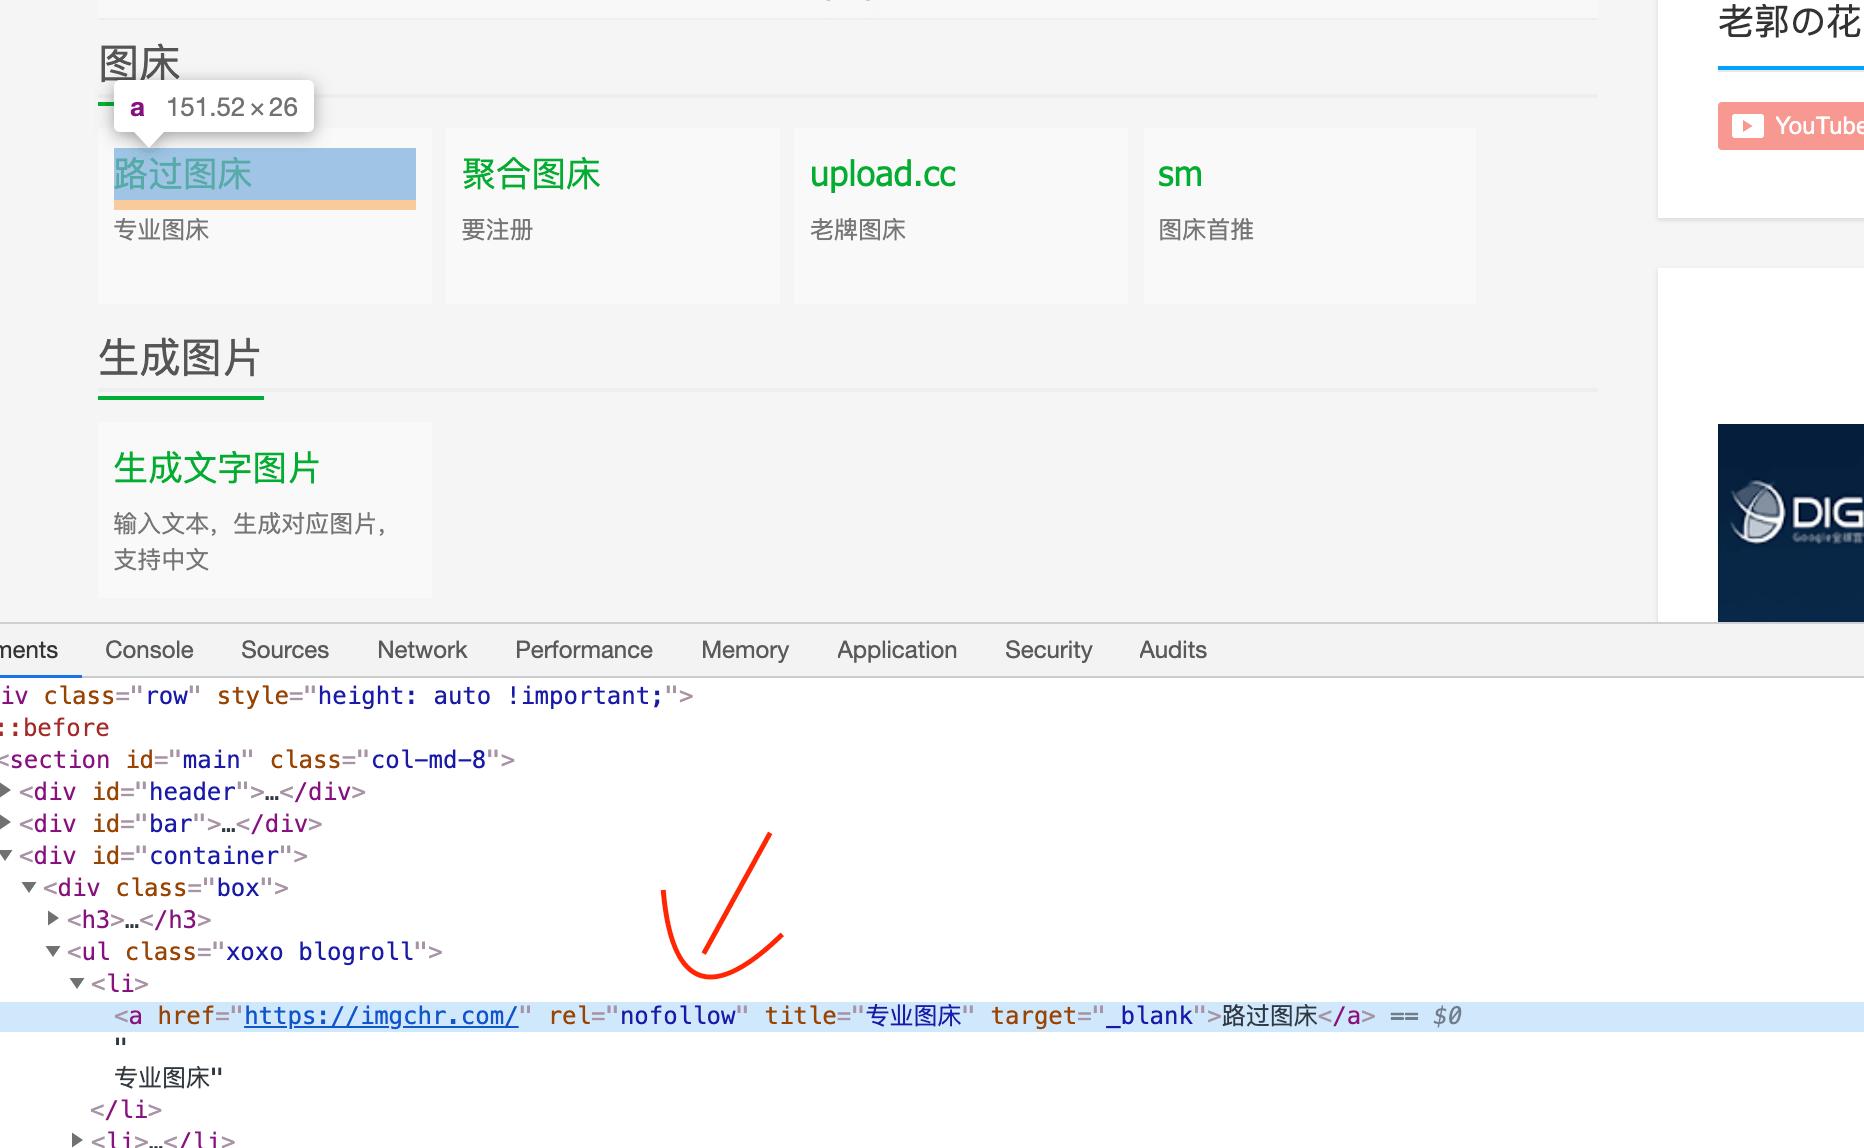 《Wordpress制作网站资源导航页面 网址收藏 From 剽窃》